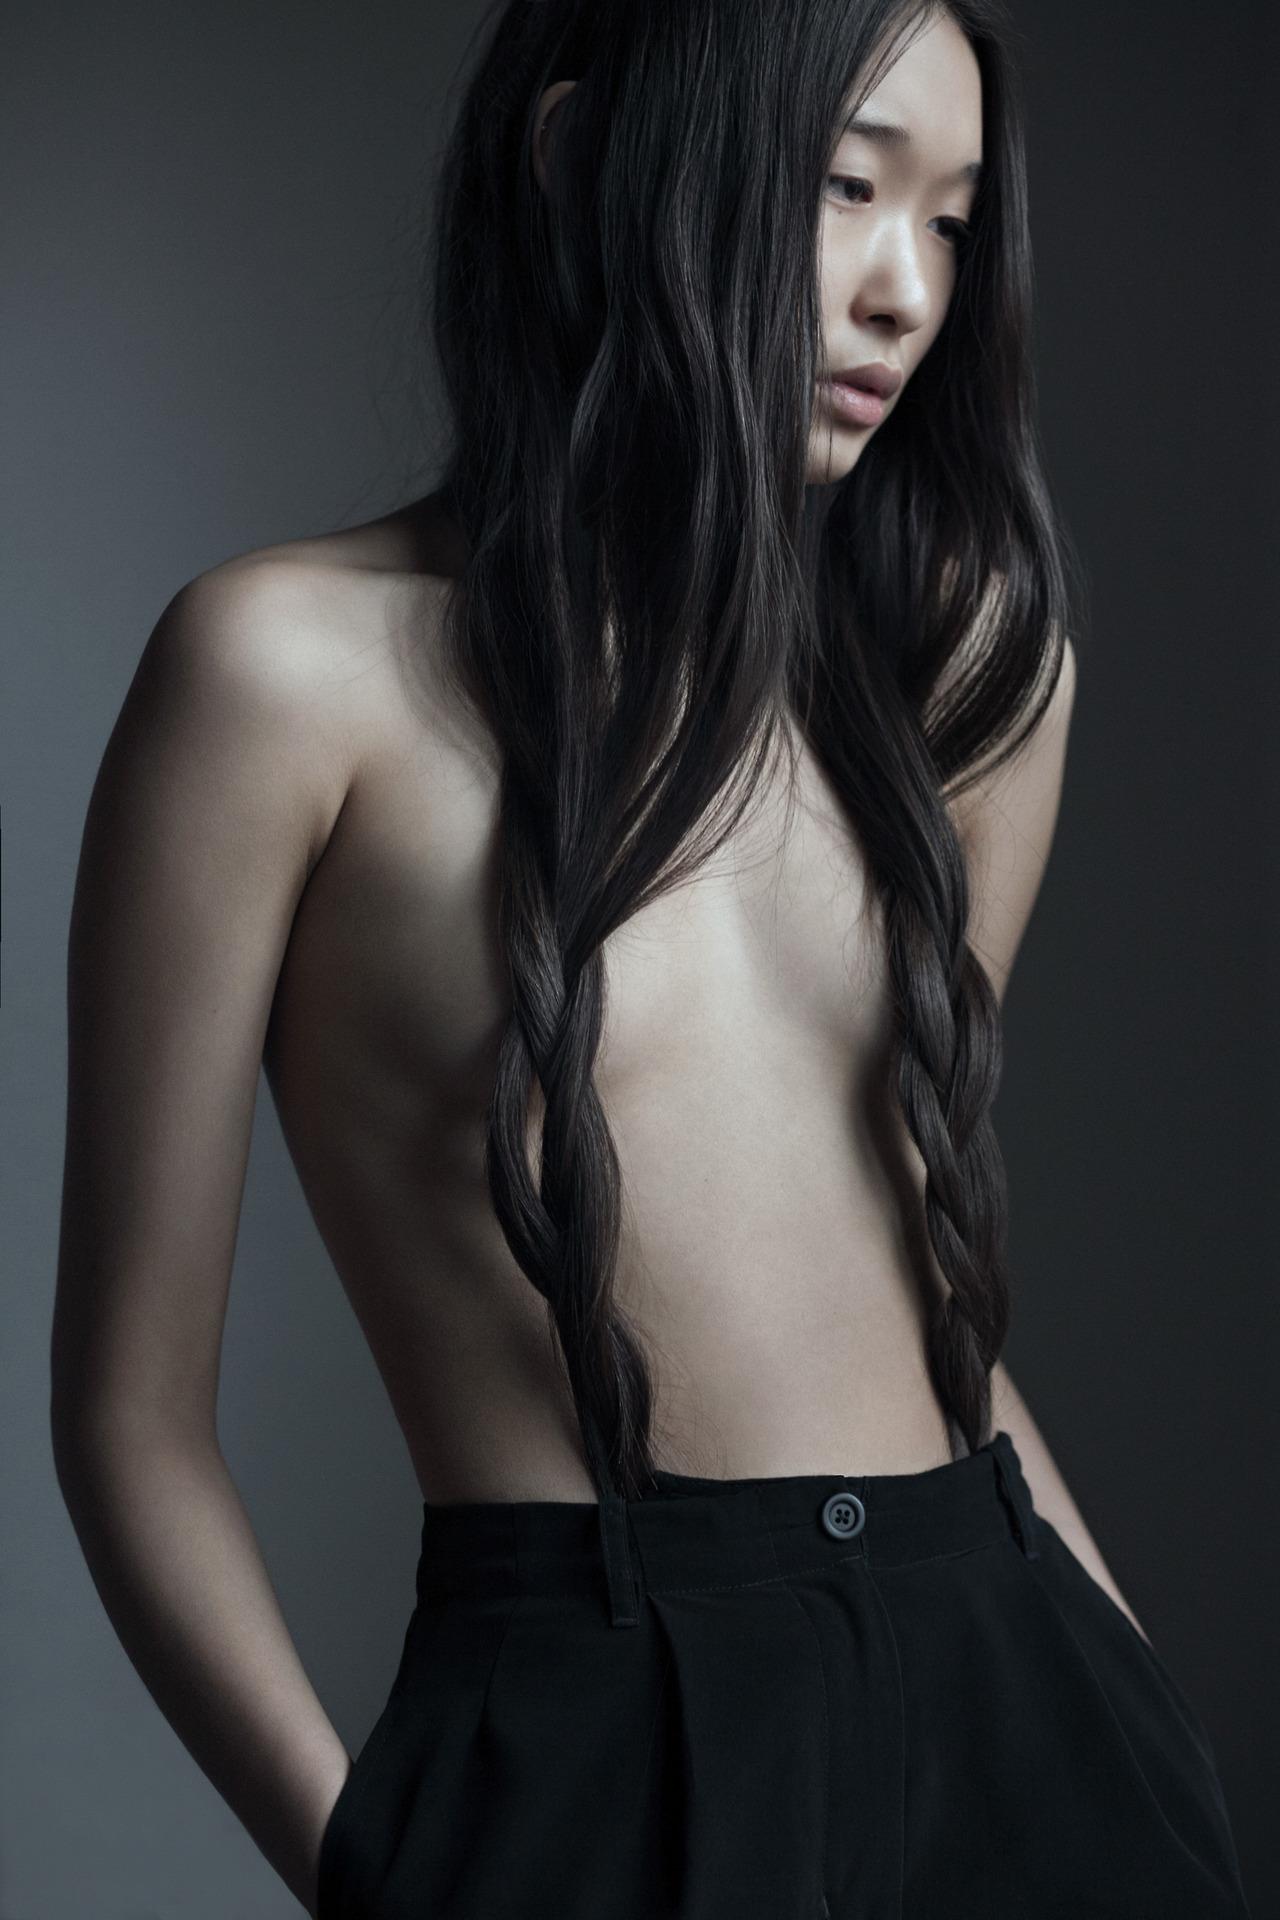 scene girl thinspo nude